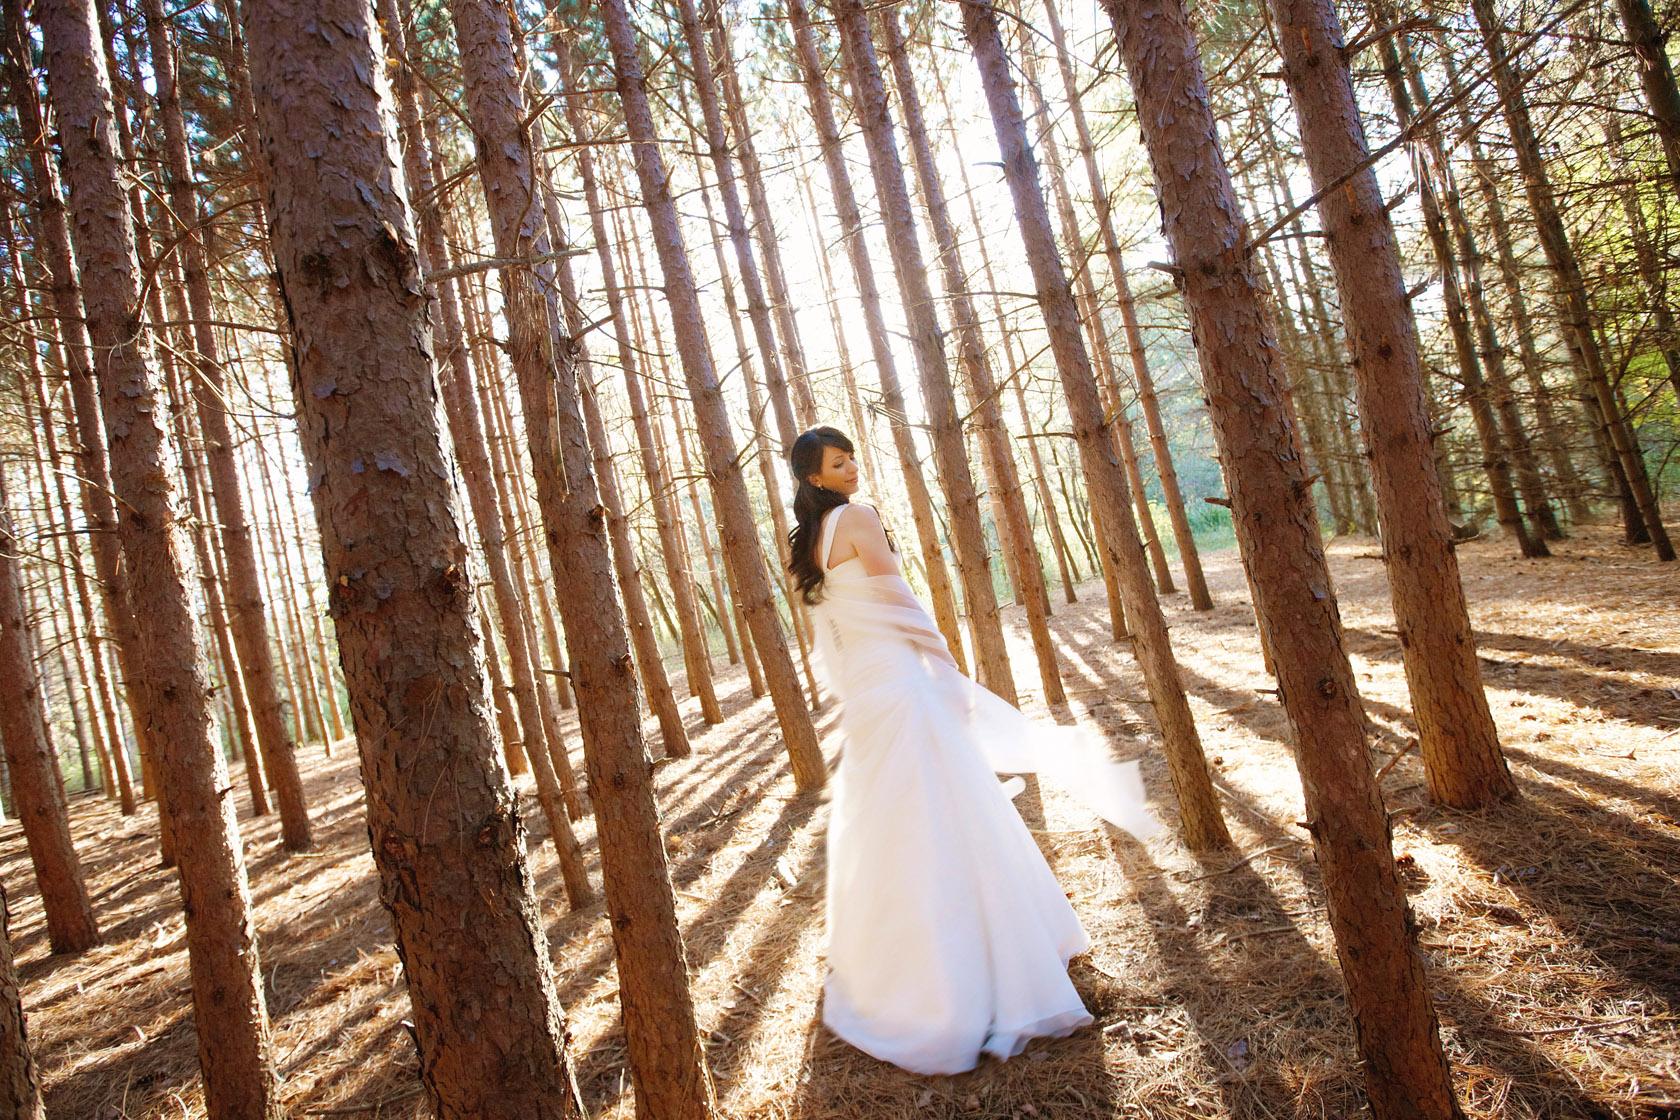 stephen sager photography 2202 toronto wedding photography